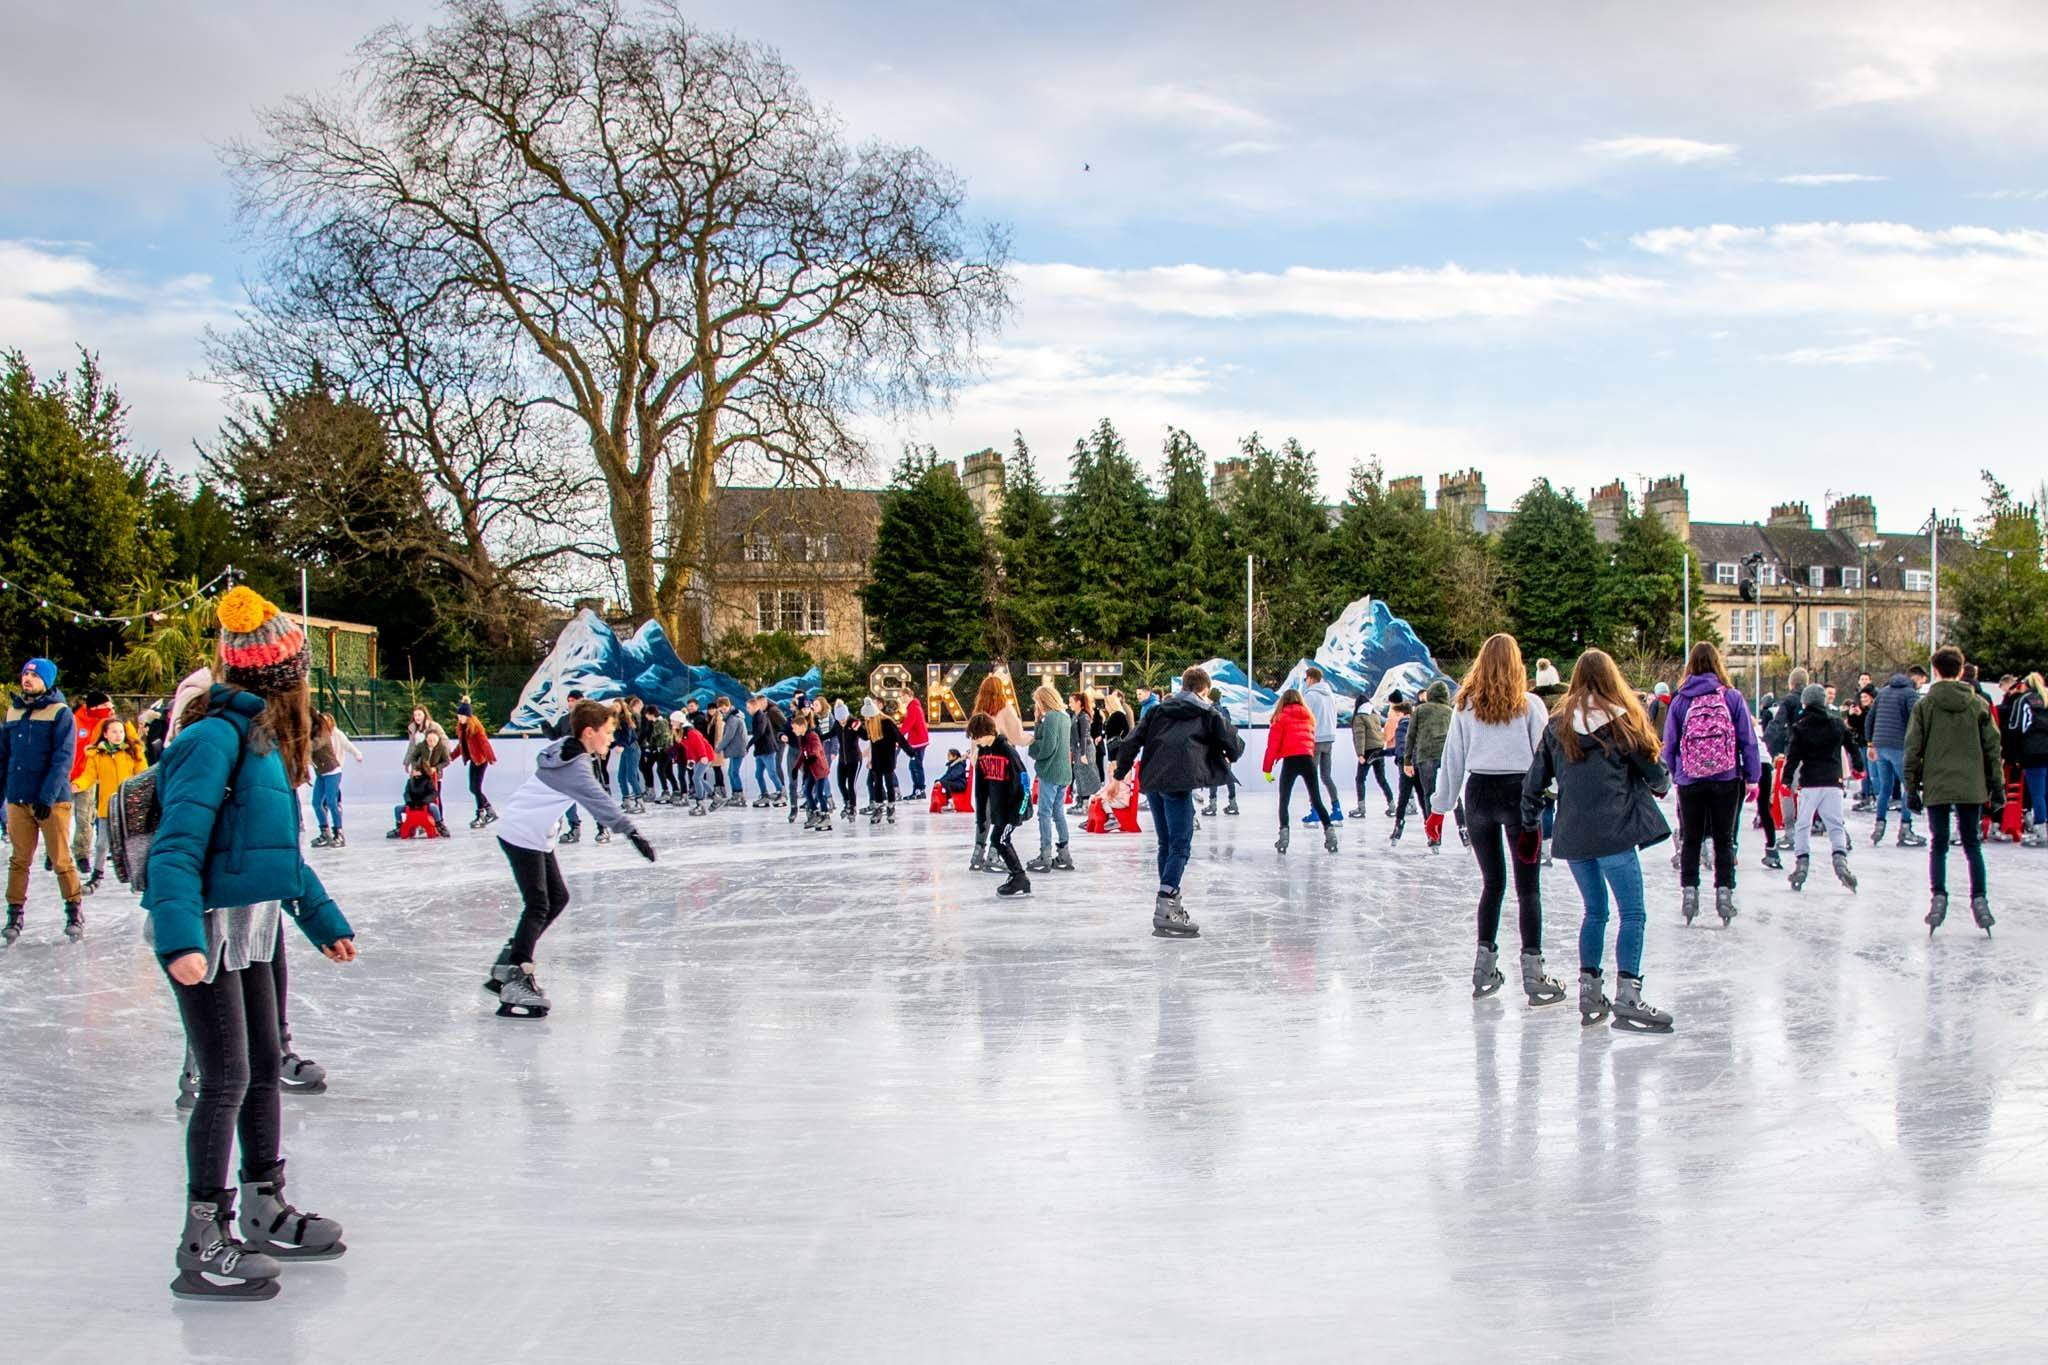 Skaters on ice-skating rink